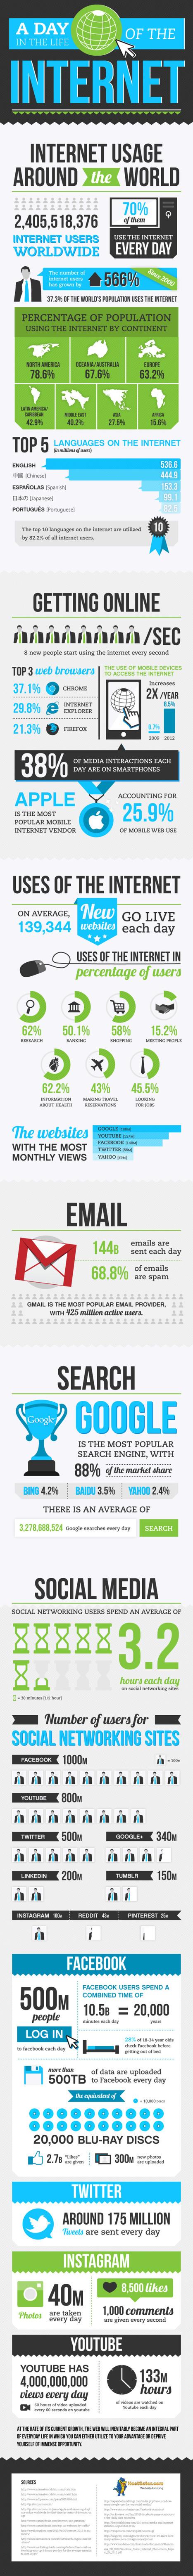 Les chiffres les plus marquants de l'internet - Mai 2013 | Social Media and Web Infographics hh | Scoop.it